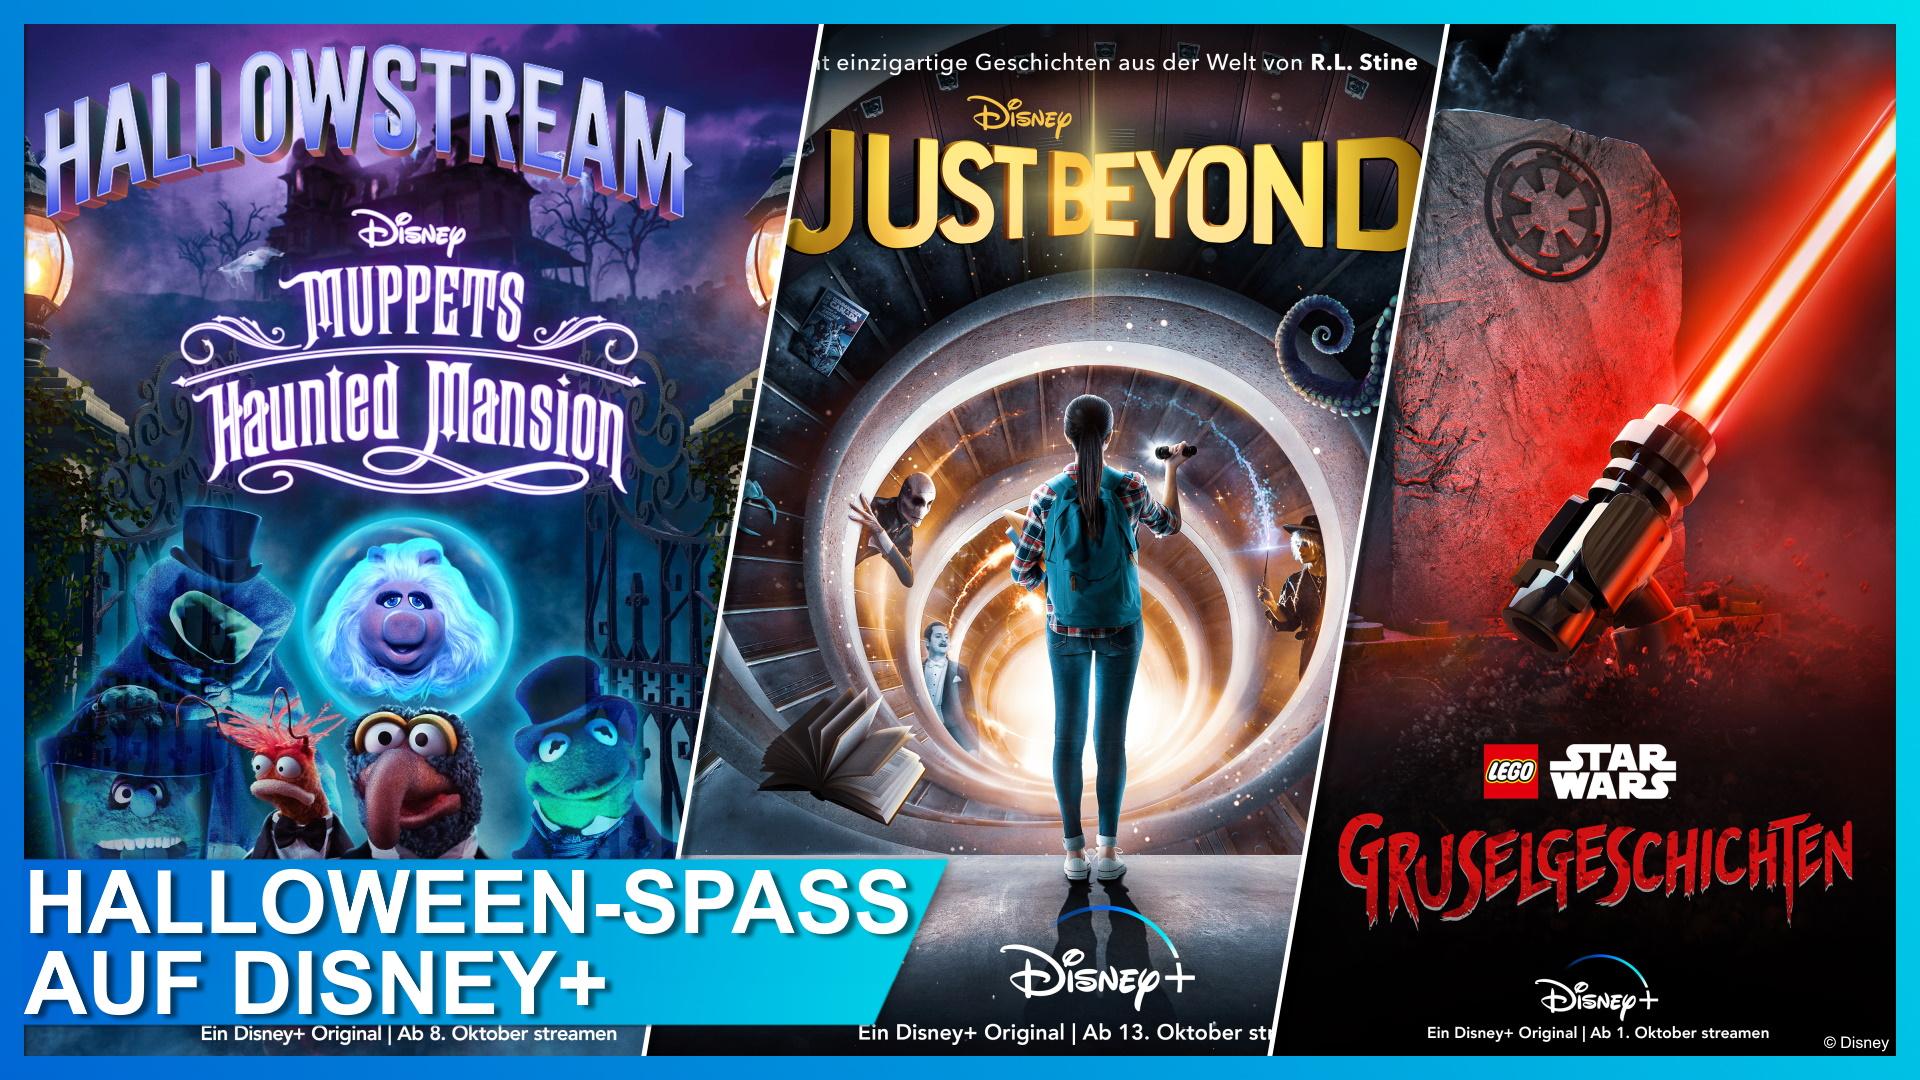 Disney+ Hallowstream 2021